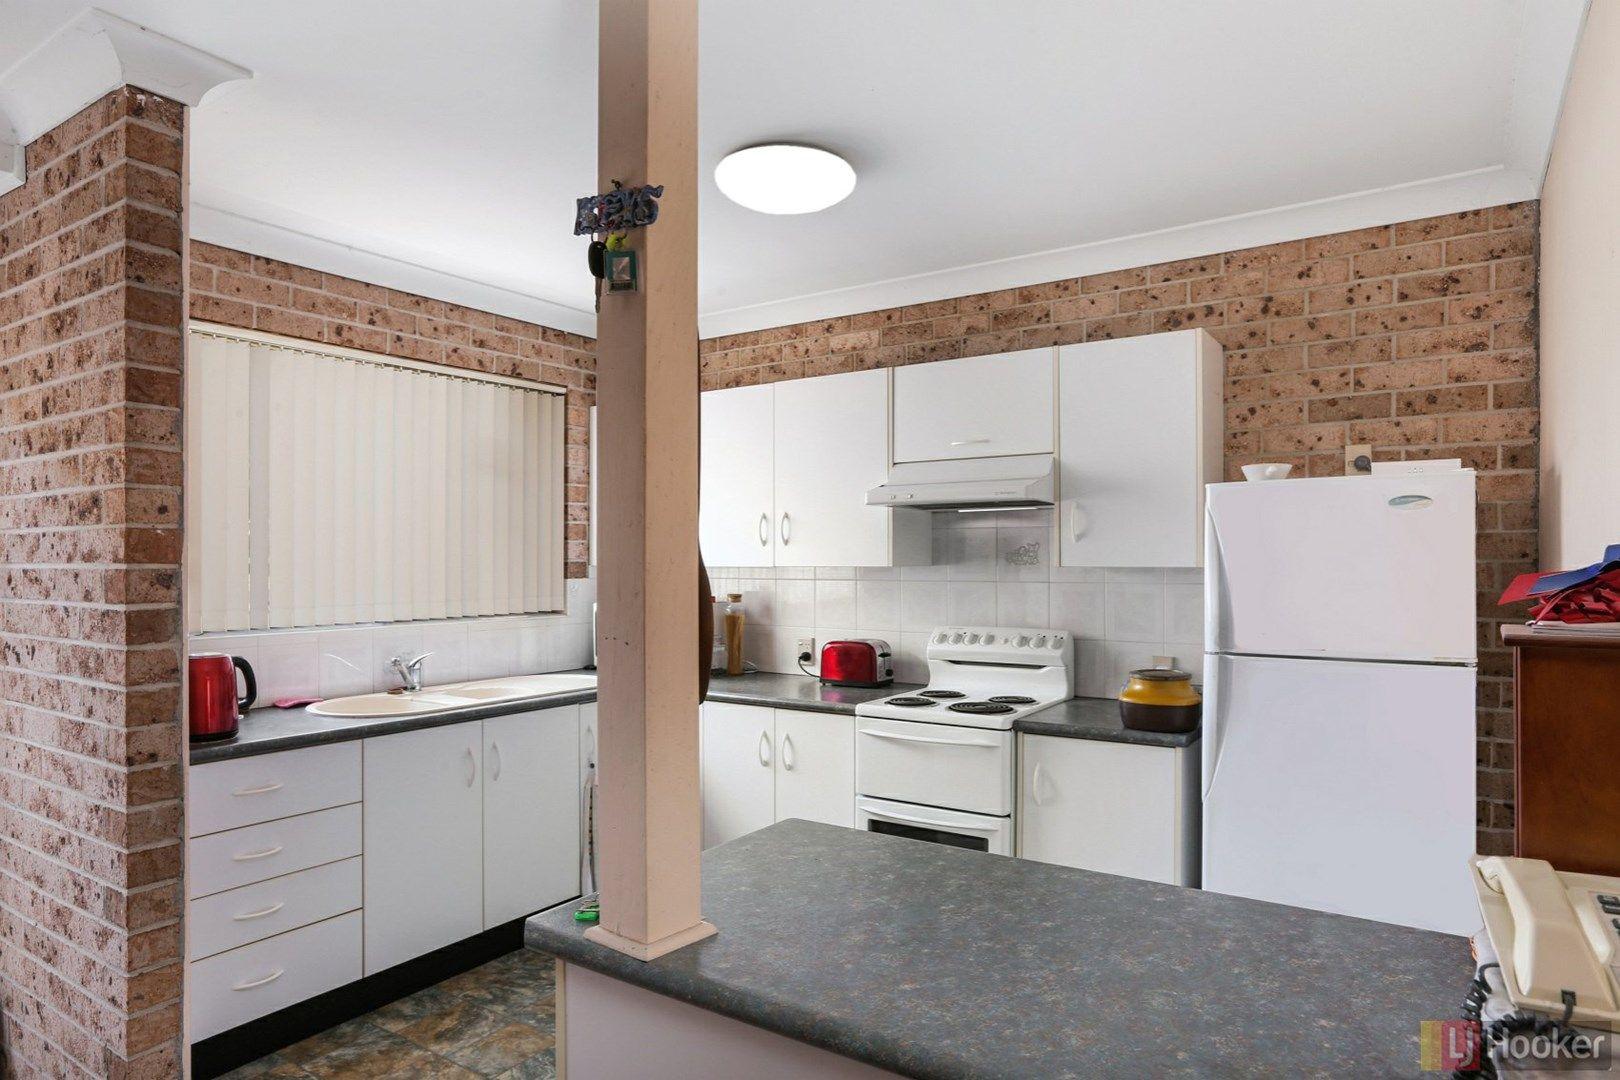 39/18 Rudder Street, East Kempsey NSW 2440, Image 0